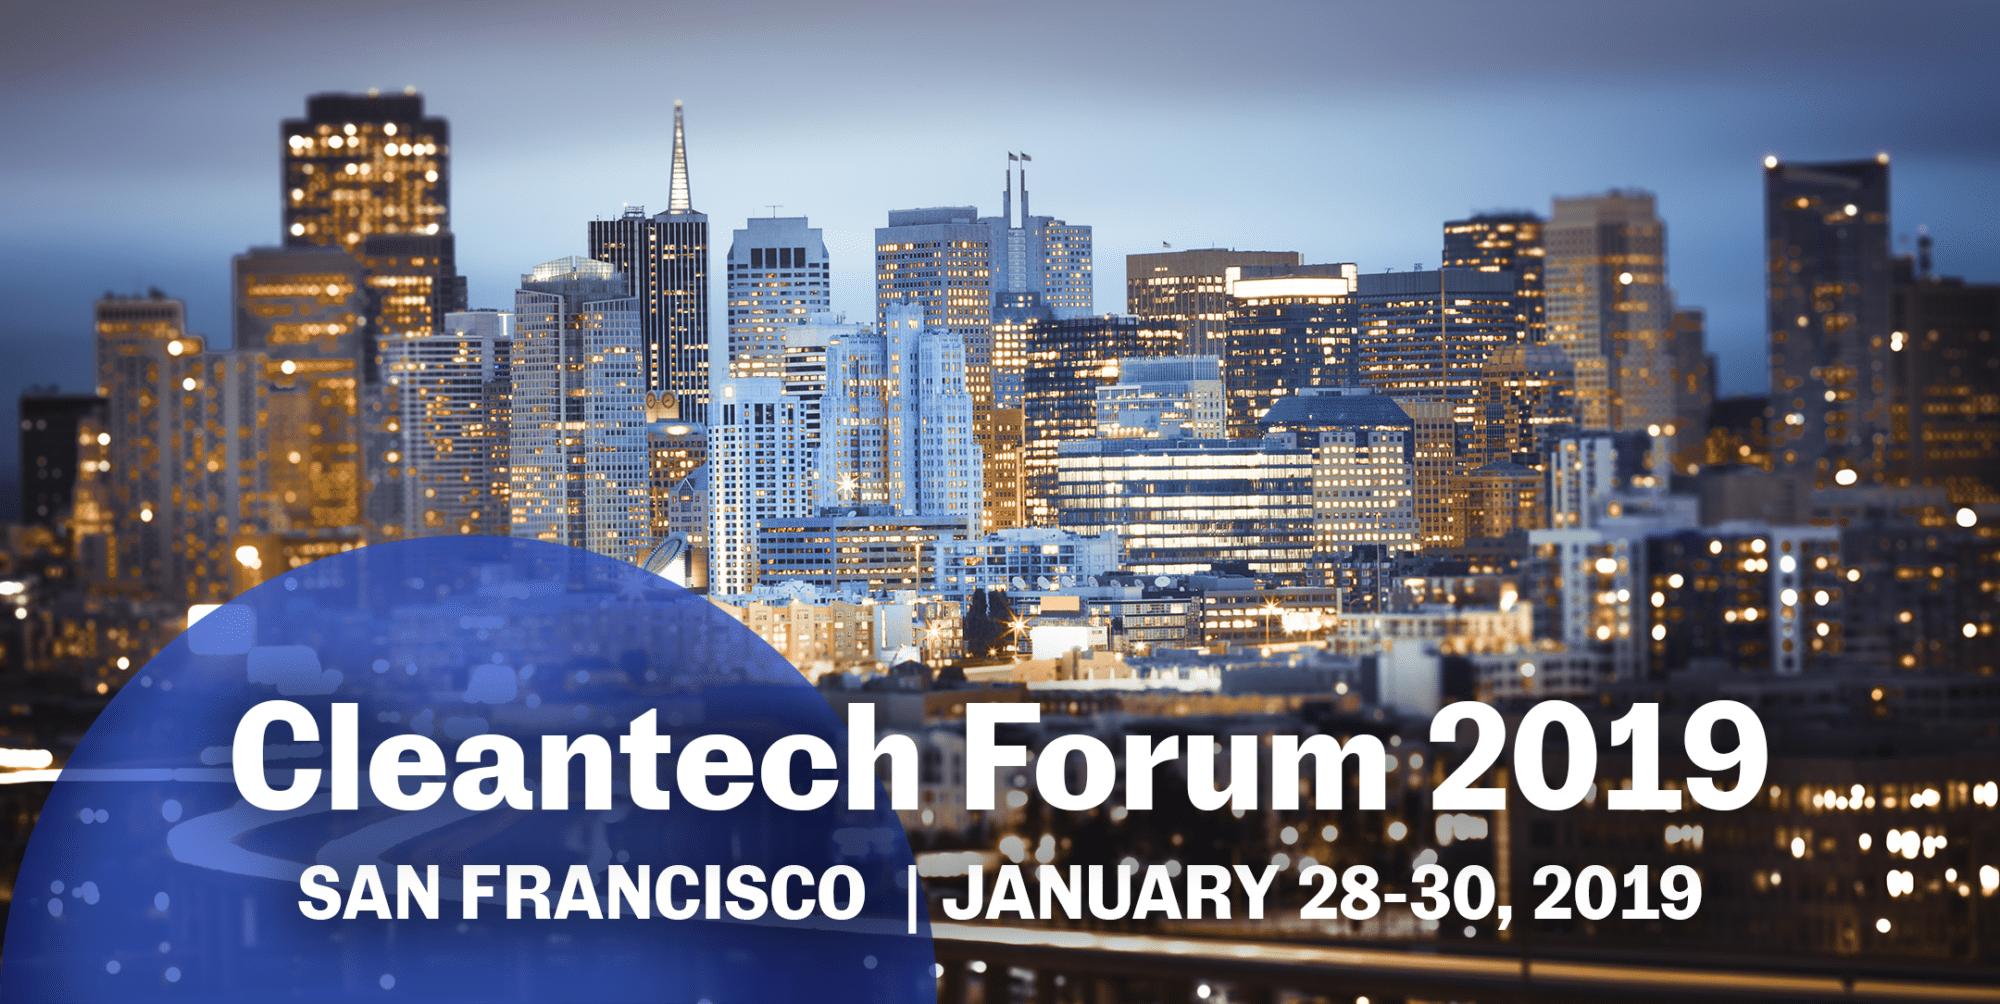 Cleantech Forum 2019 Mars